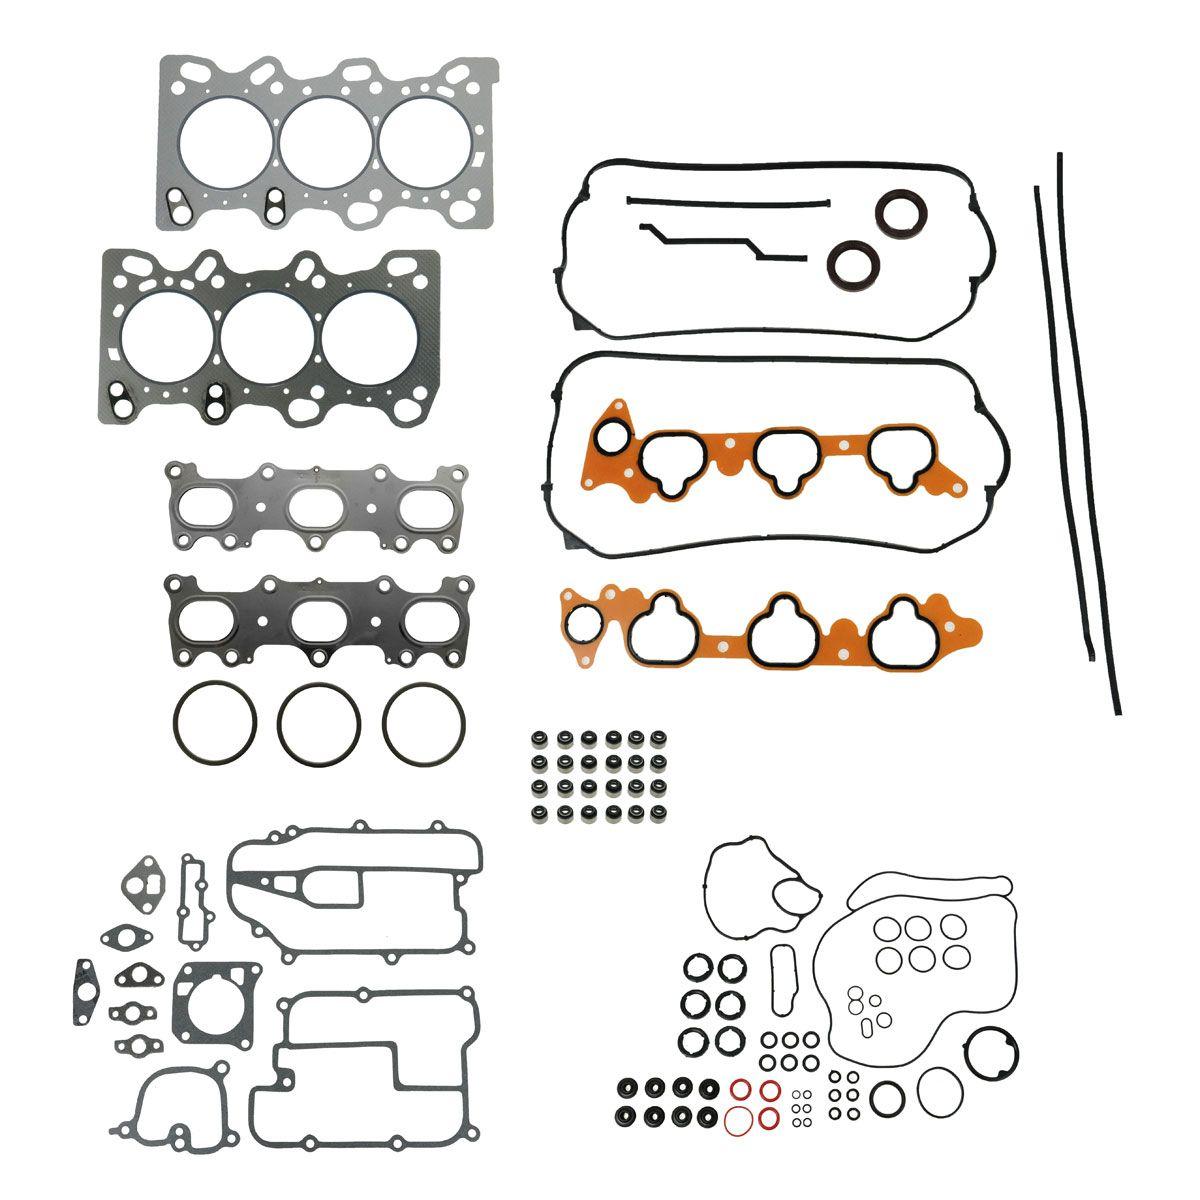 Engine Head Intake Exhaust Manifold Gasket Set Kit For